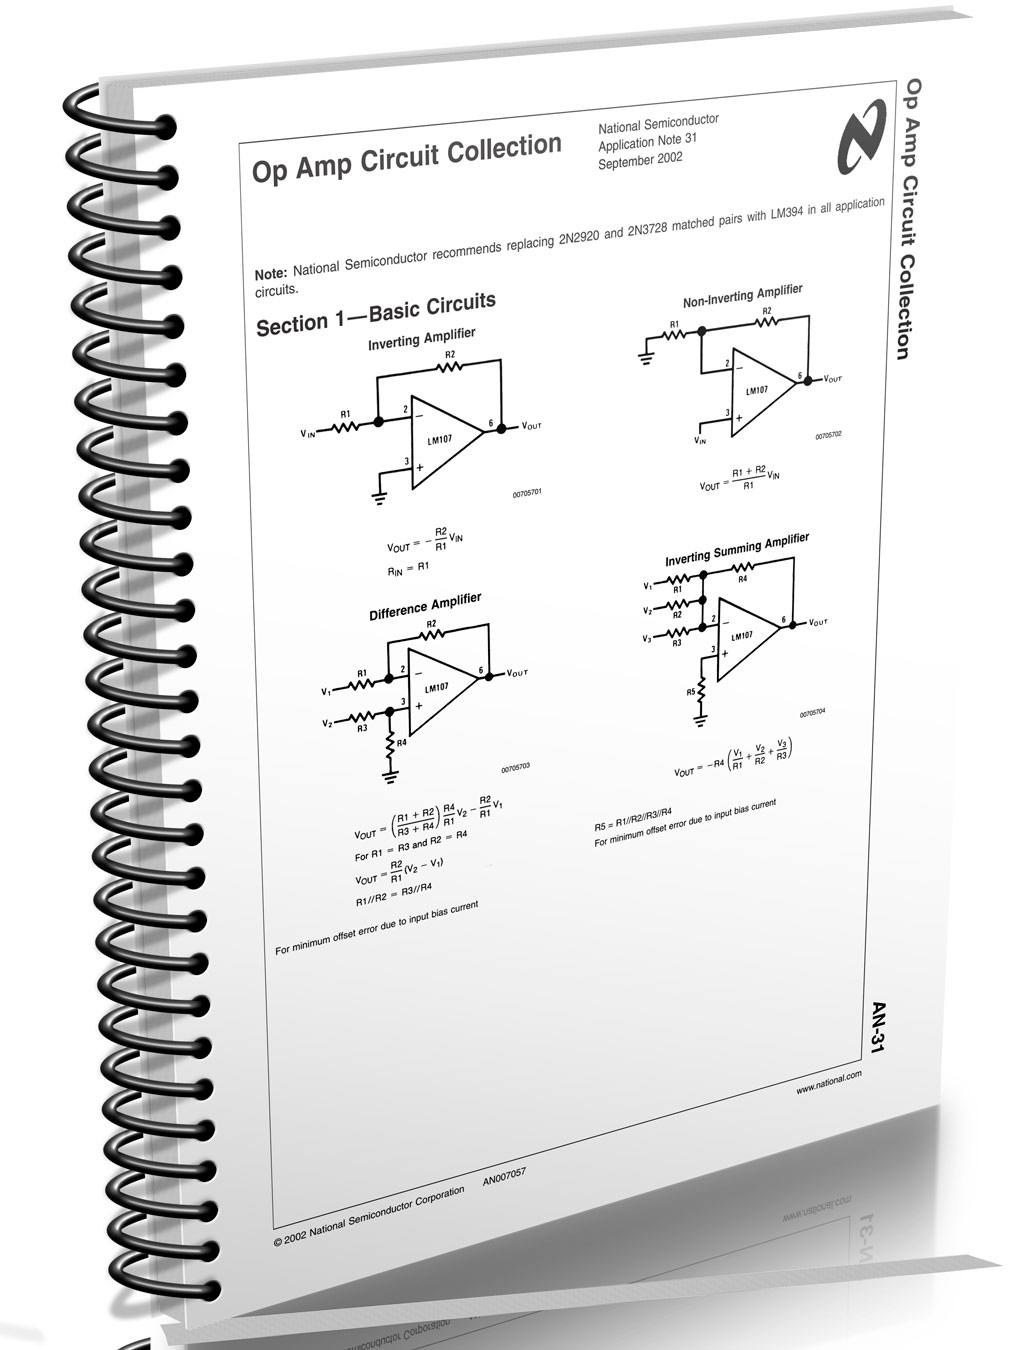 Download Application Note 31 Coleo De Circuitos Op Amp Te1 Summing Amplifier An31 Texas Opamp 700x923 Teste E